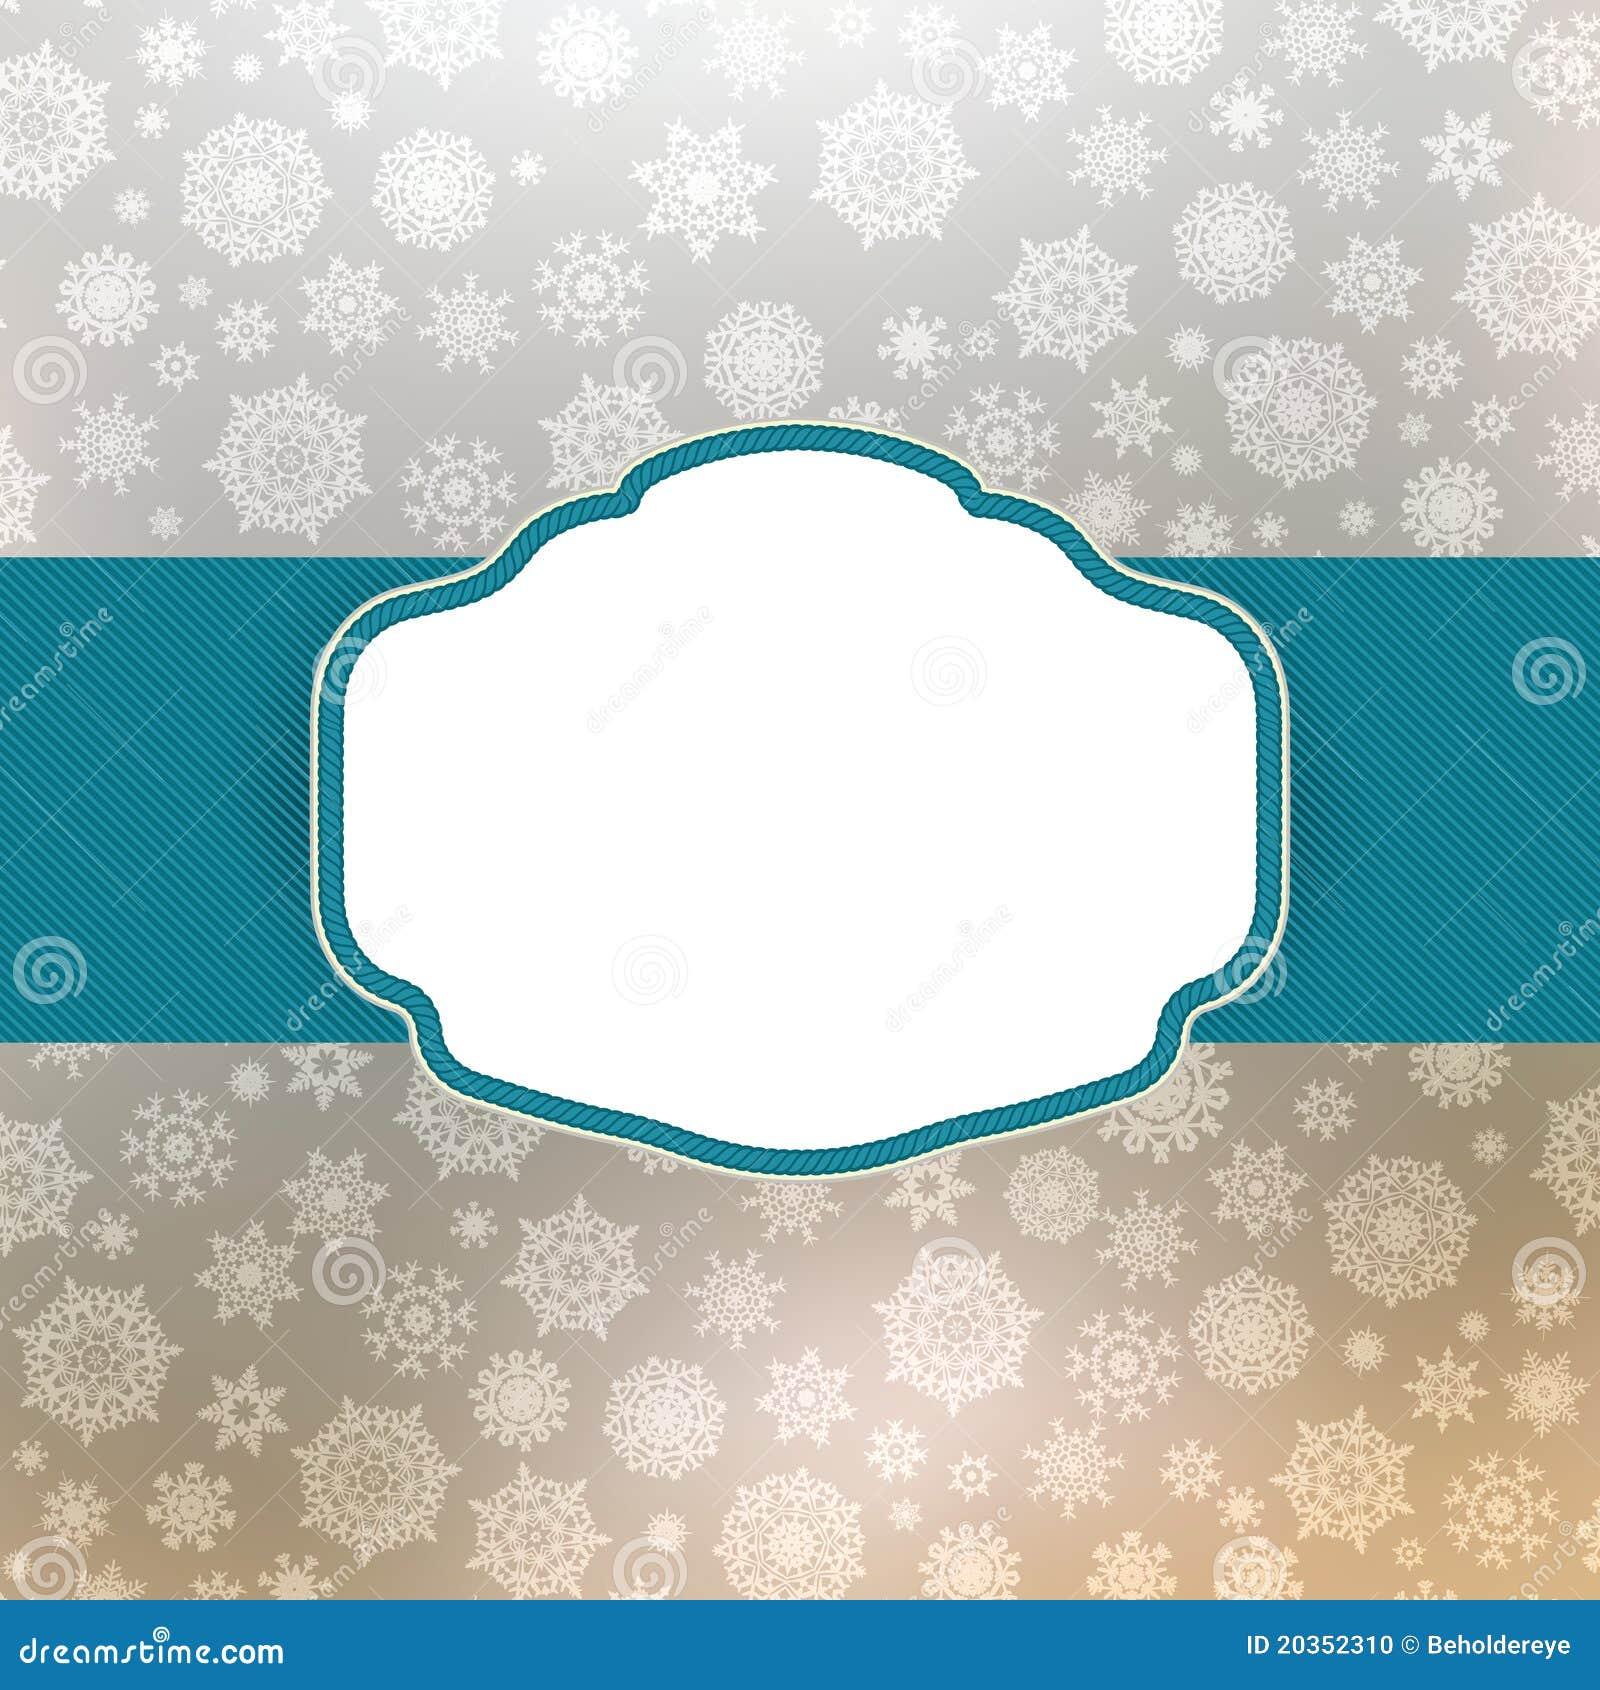 template frame design for christmas card eps 8 stock vector